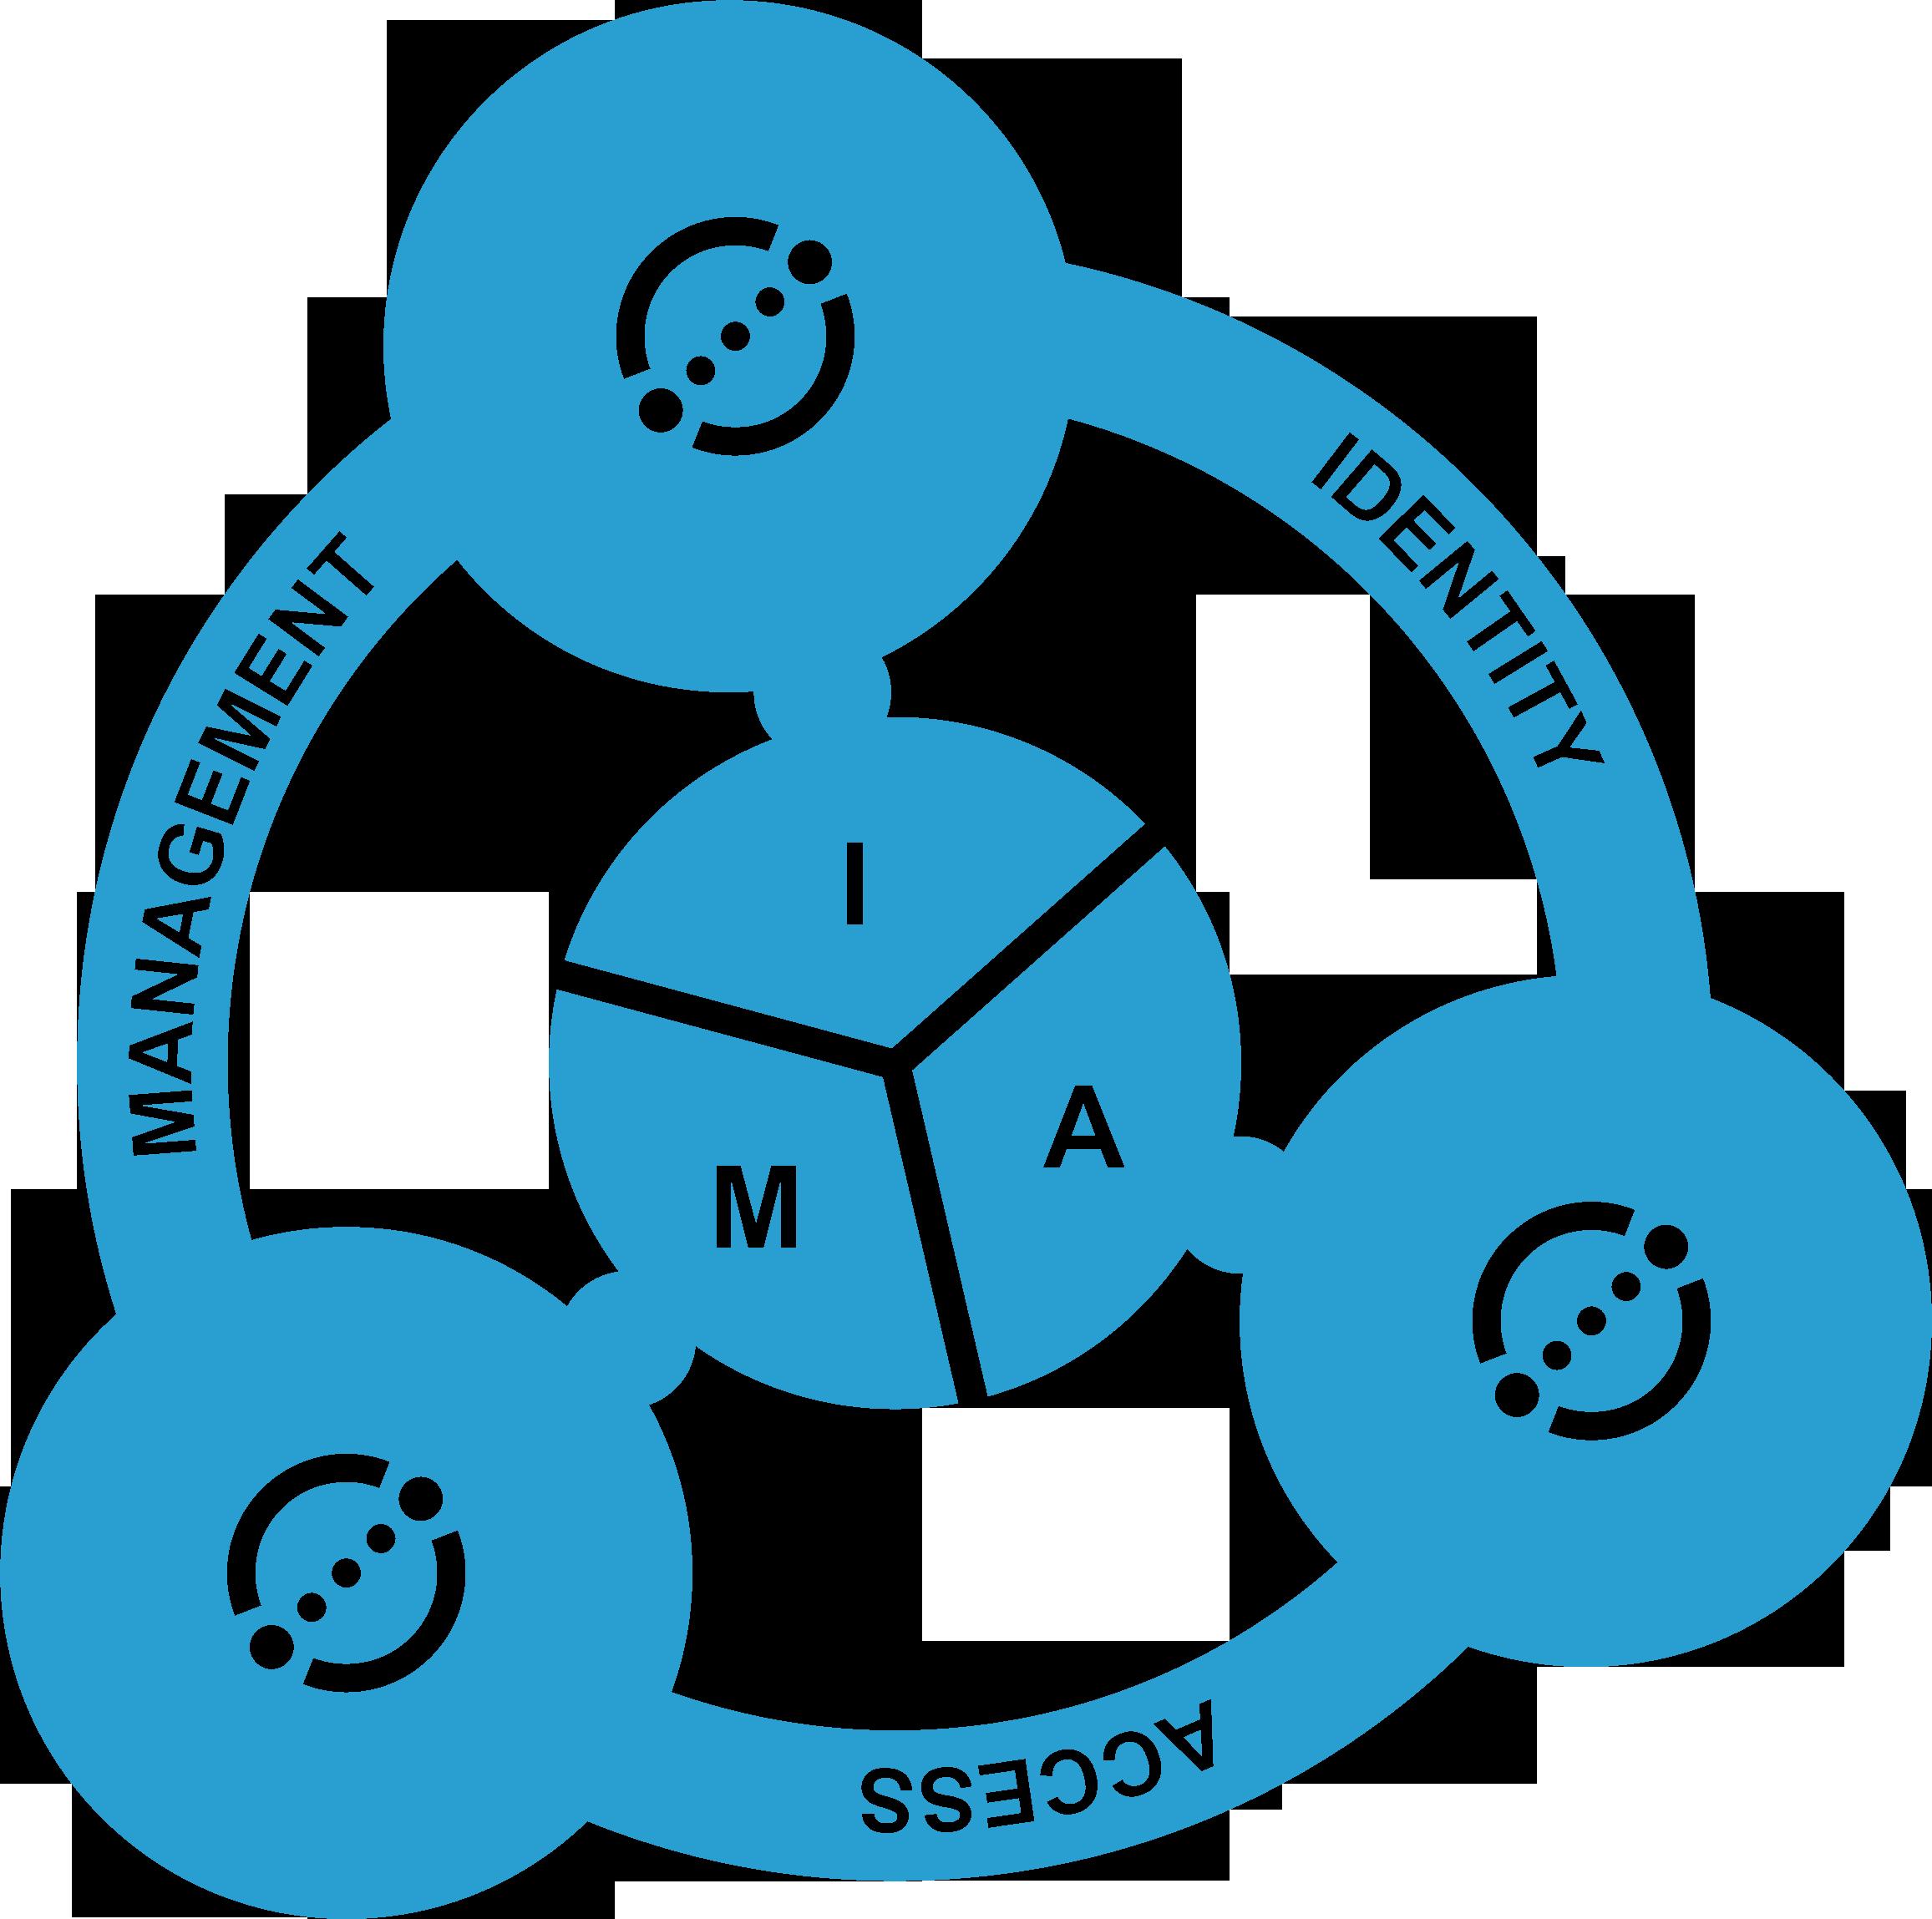 Syncbee IAM Logo